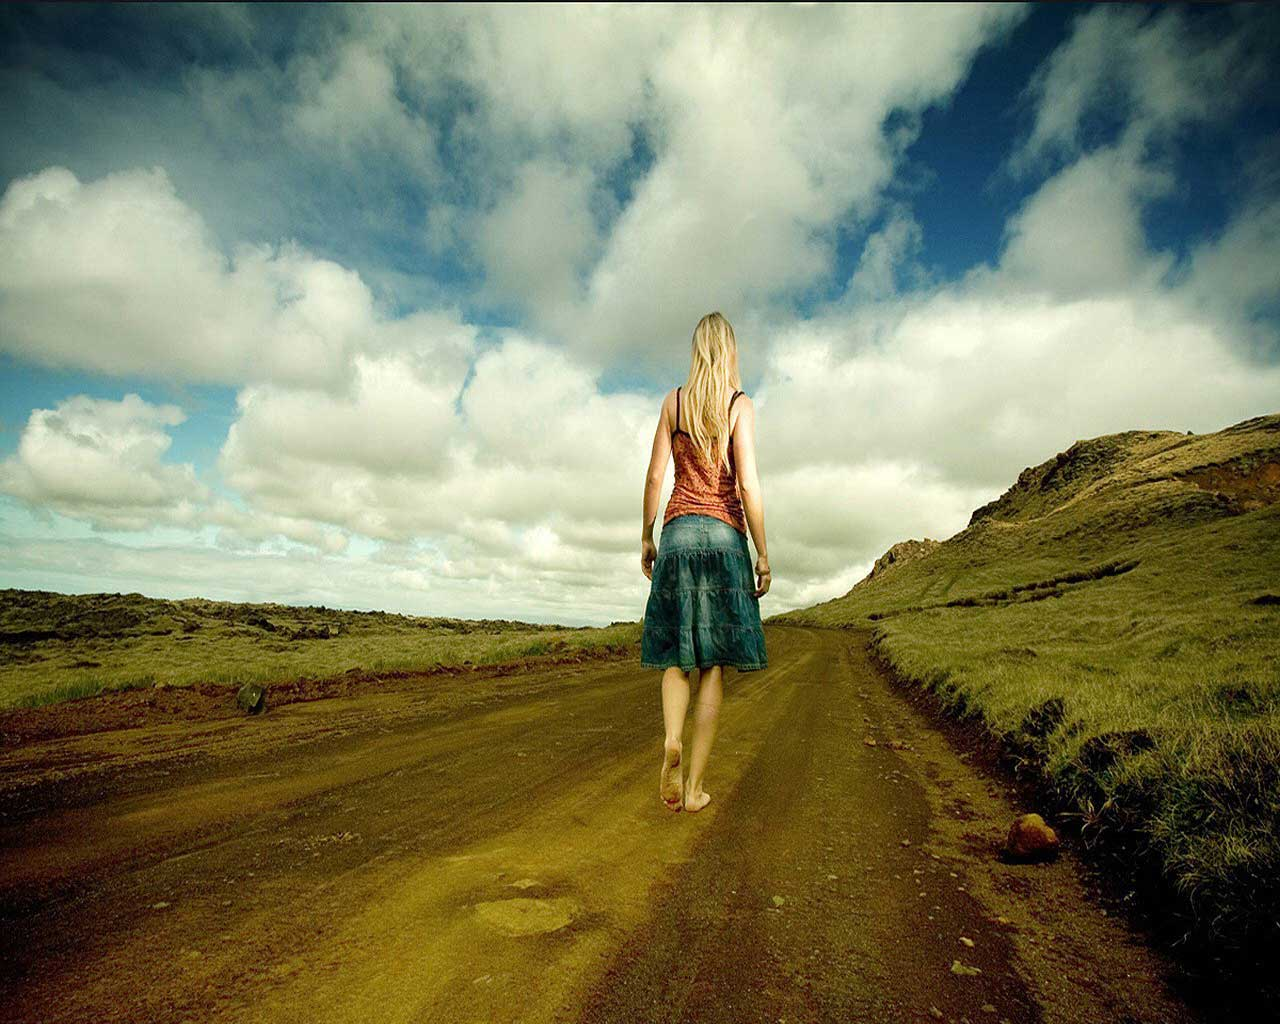 Картинка девушка идущая на компьютер, картинки на комп.: http://www.wallpage.ru/kartinka_devushka_idushaja_kompjuter-7196.php